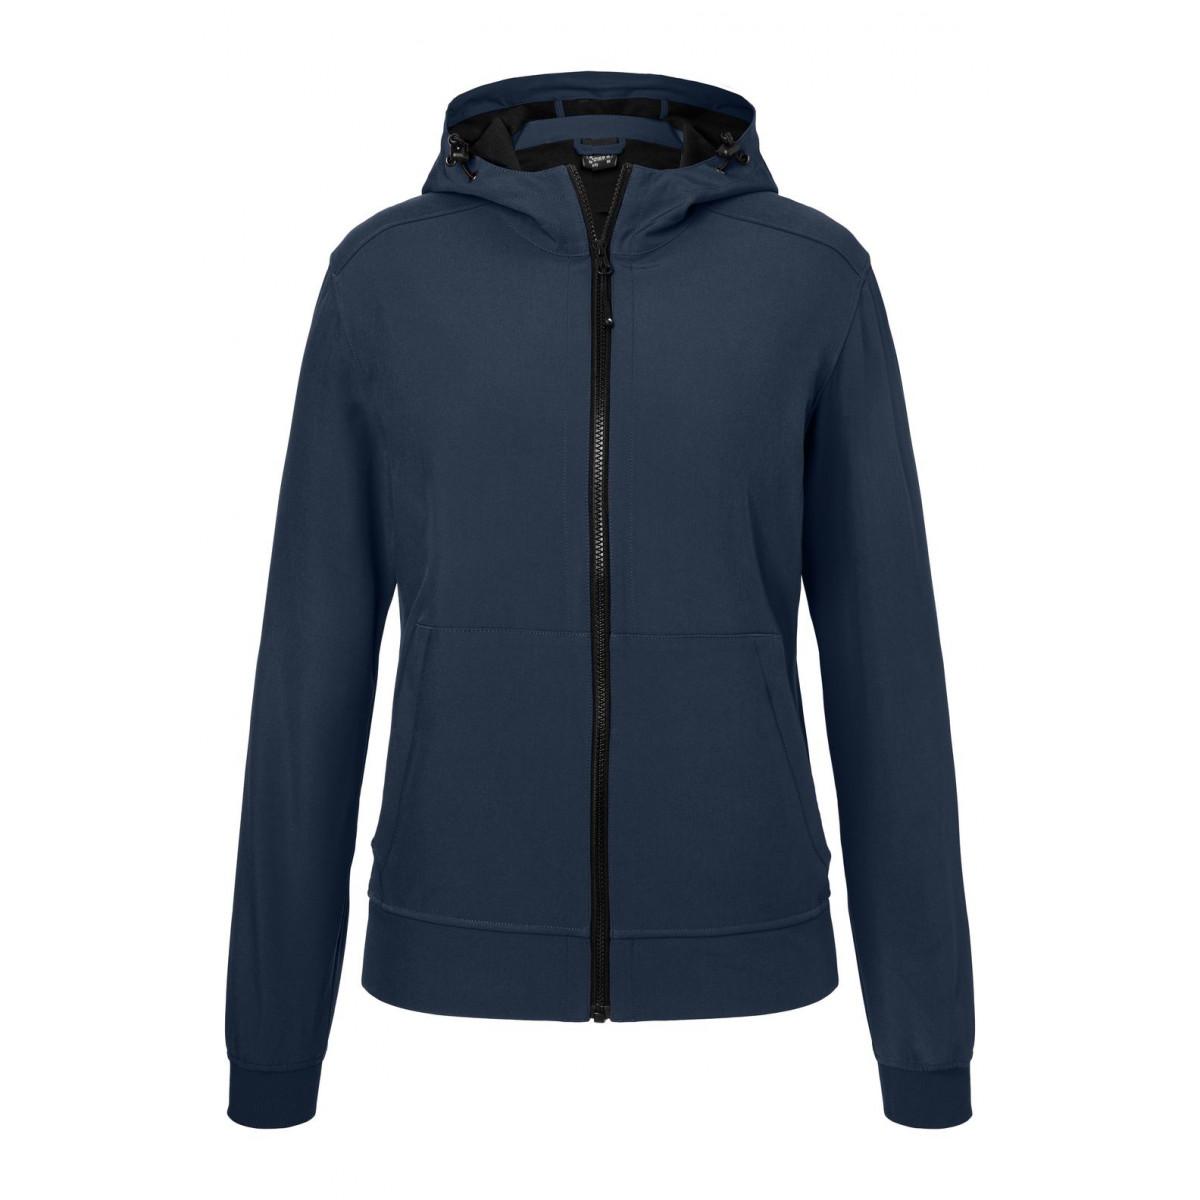 Куртка женская JN1145 Ladies Hooded Softshell Jacket - Темно-синий/Темно-синий